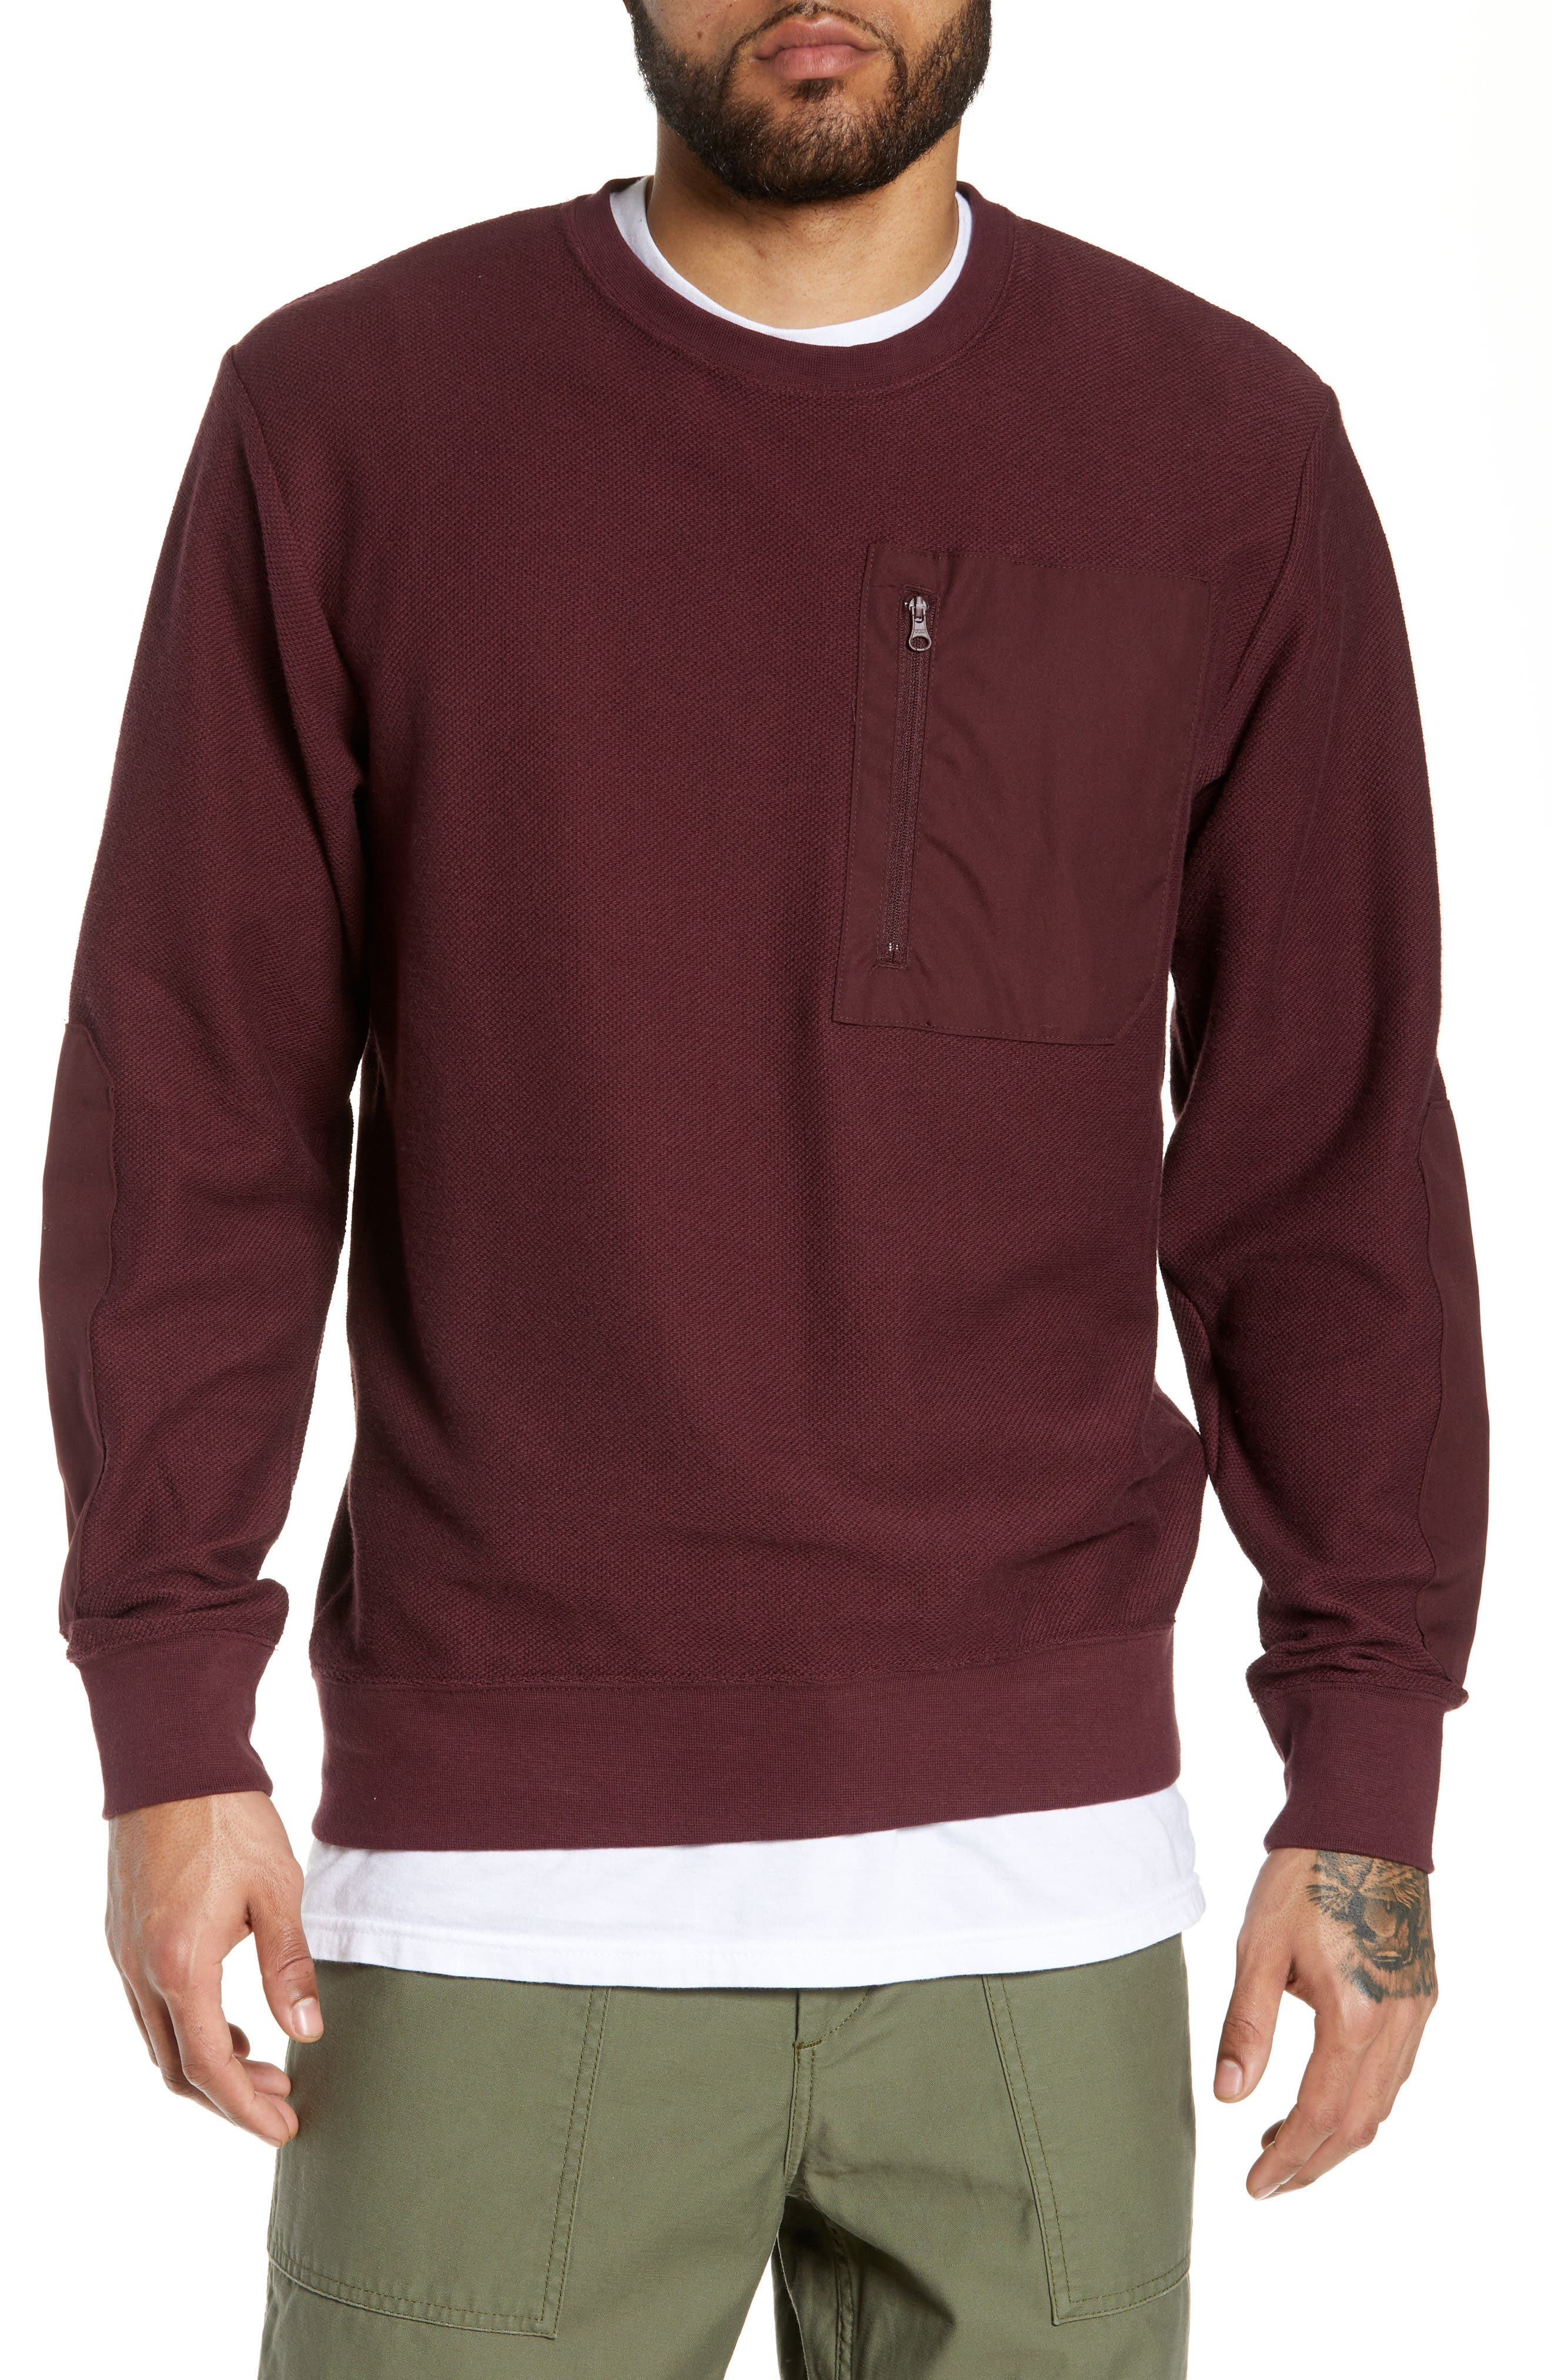 Nike Sb Long Sleeve T-Shirt, Burgundy